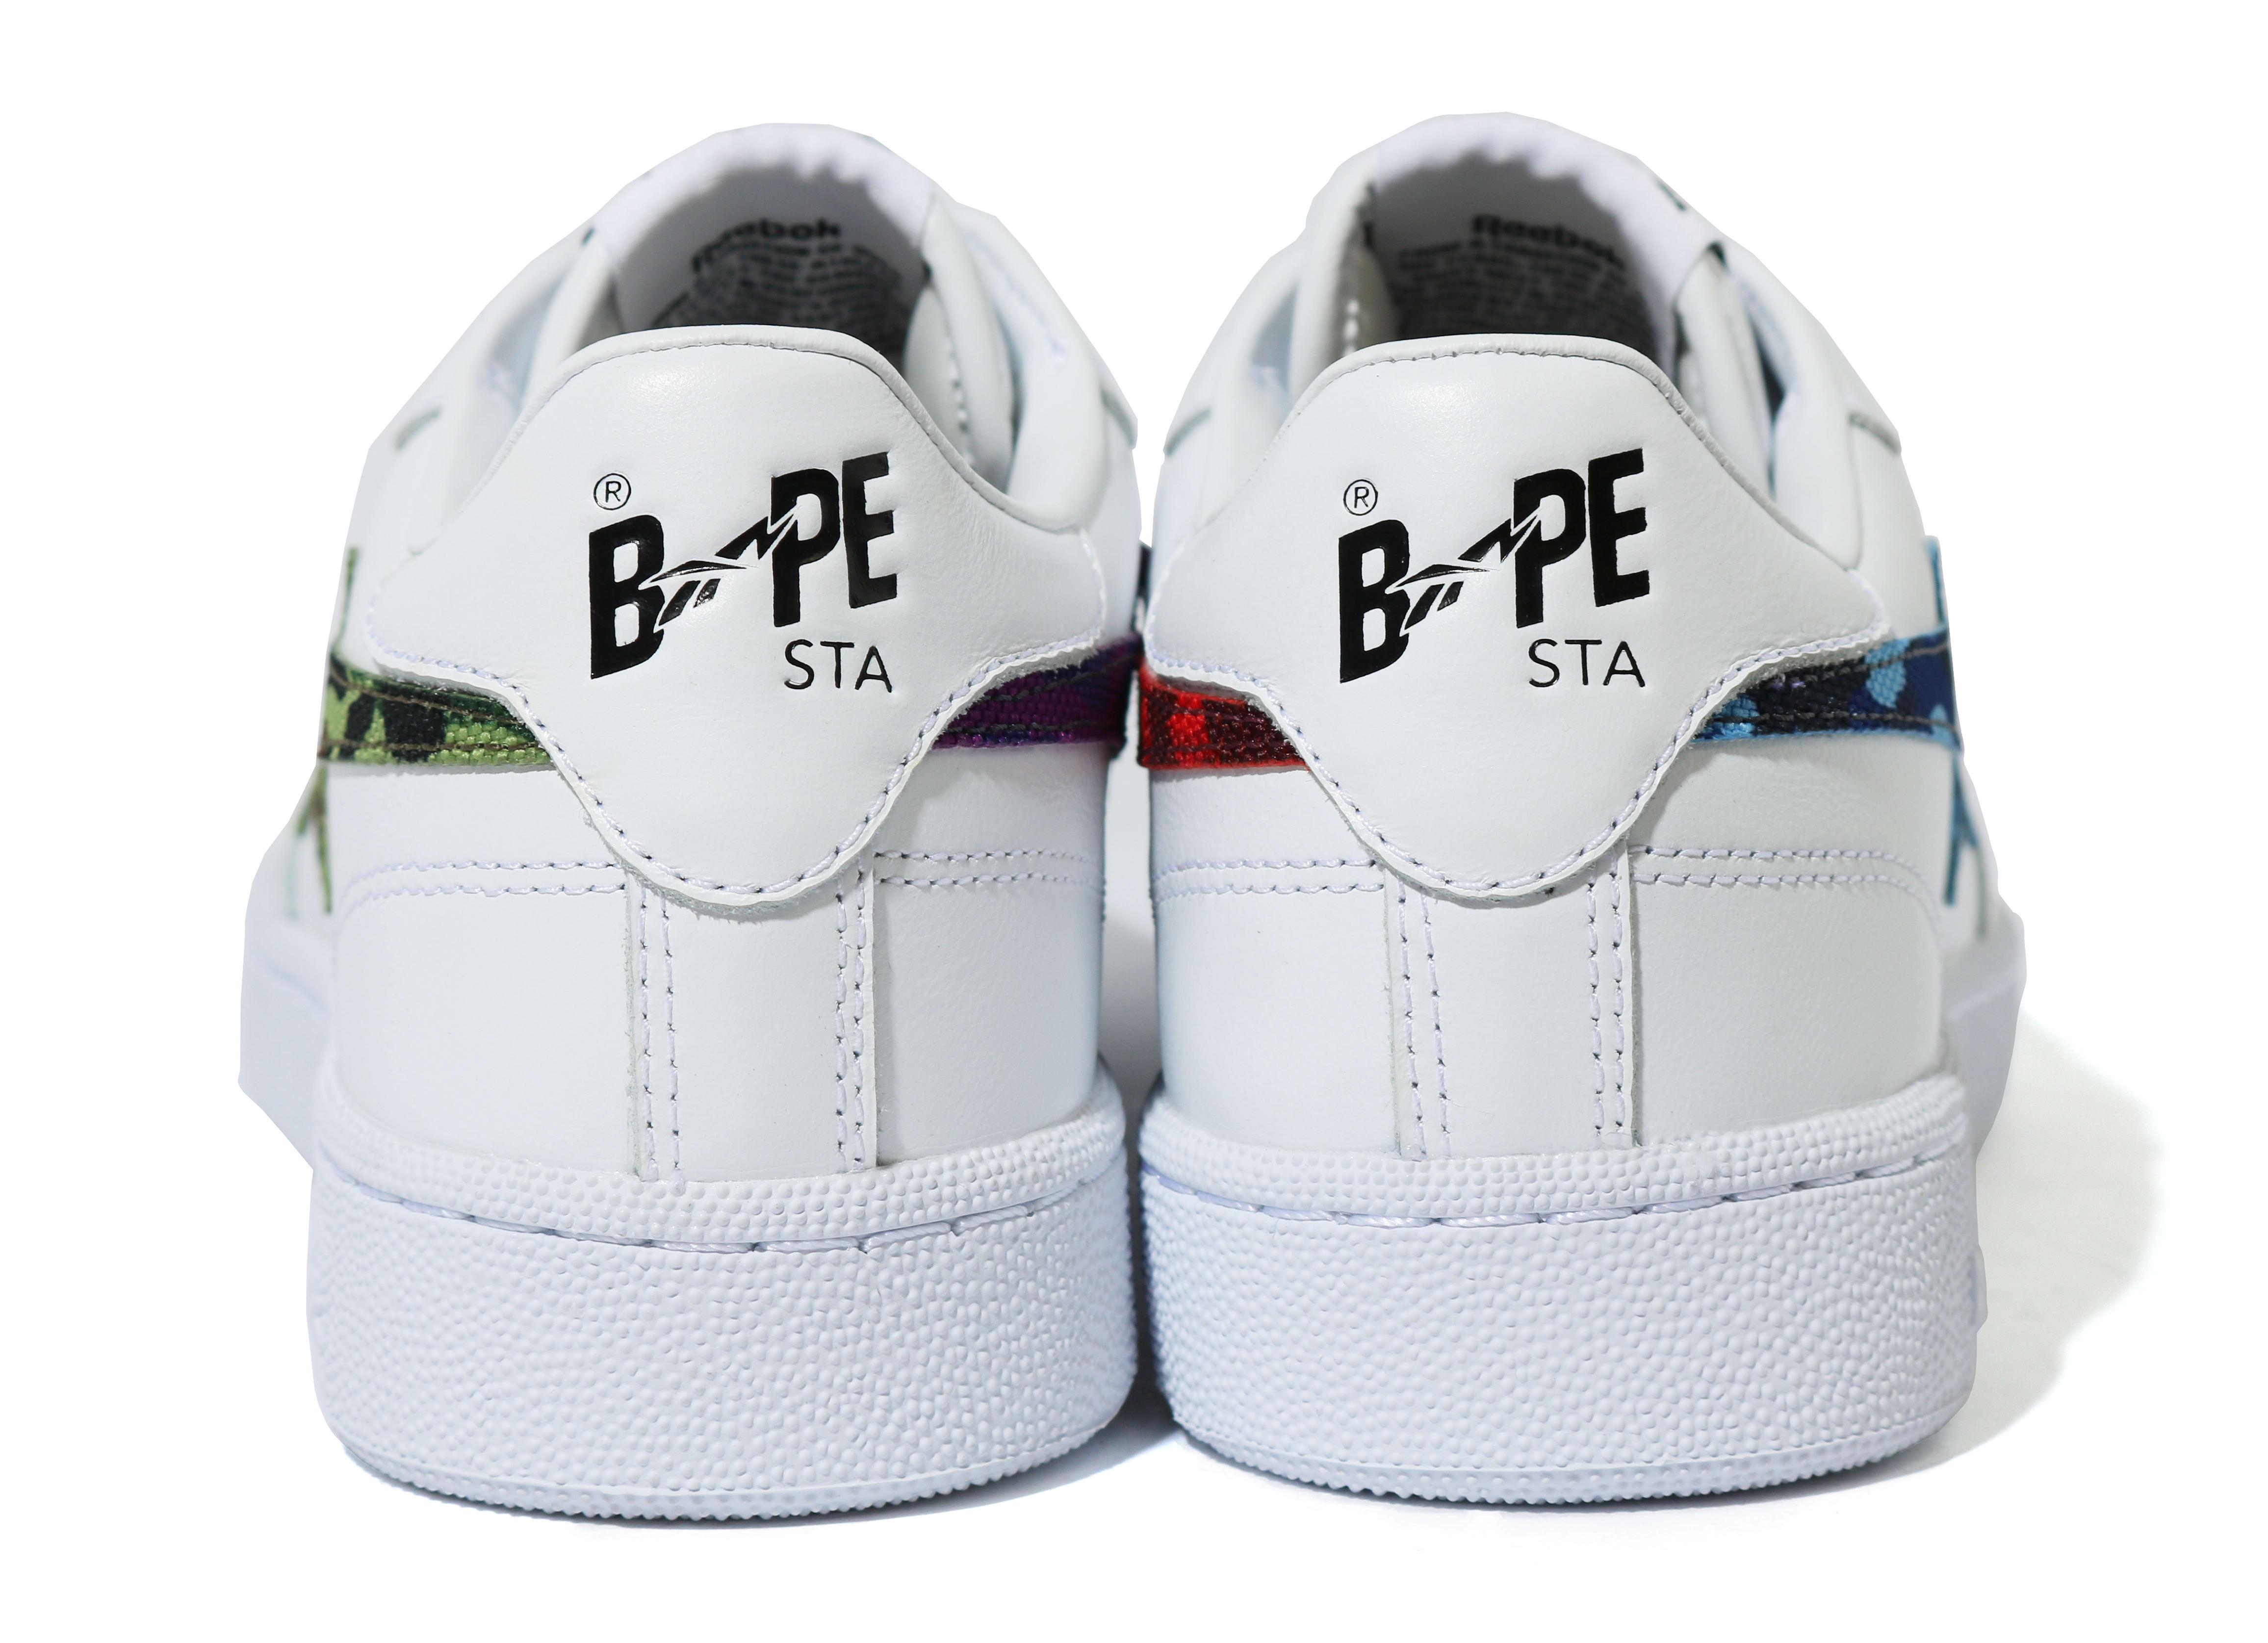 Bape x Reebok Club C FY3603 Heel